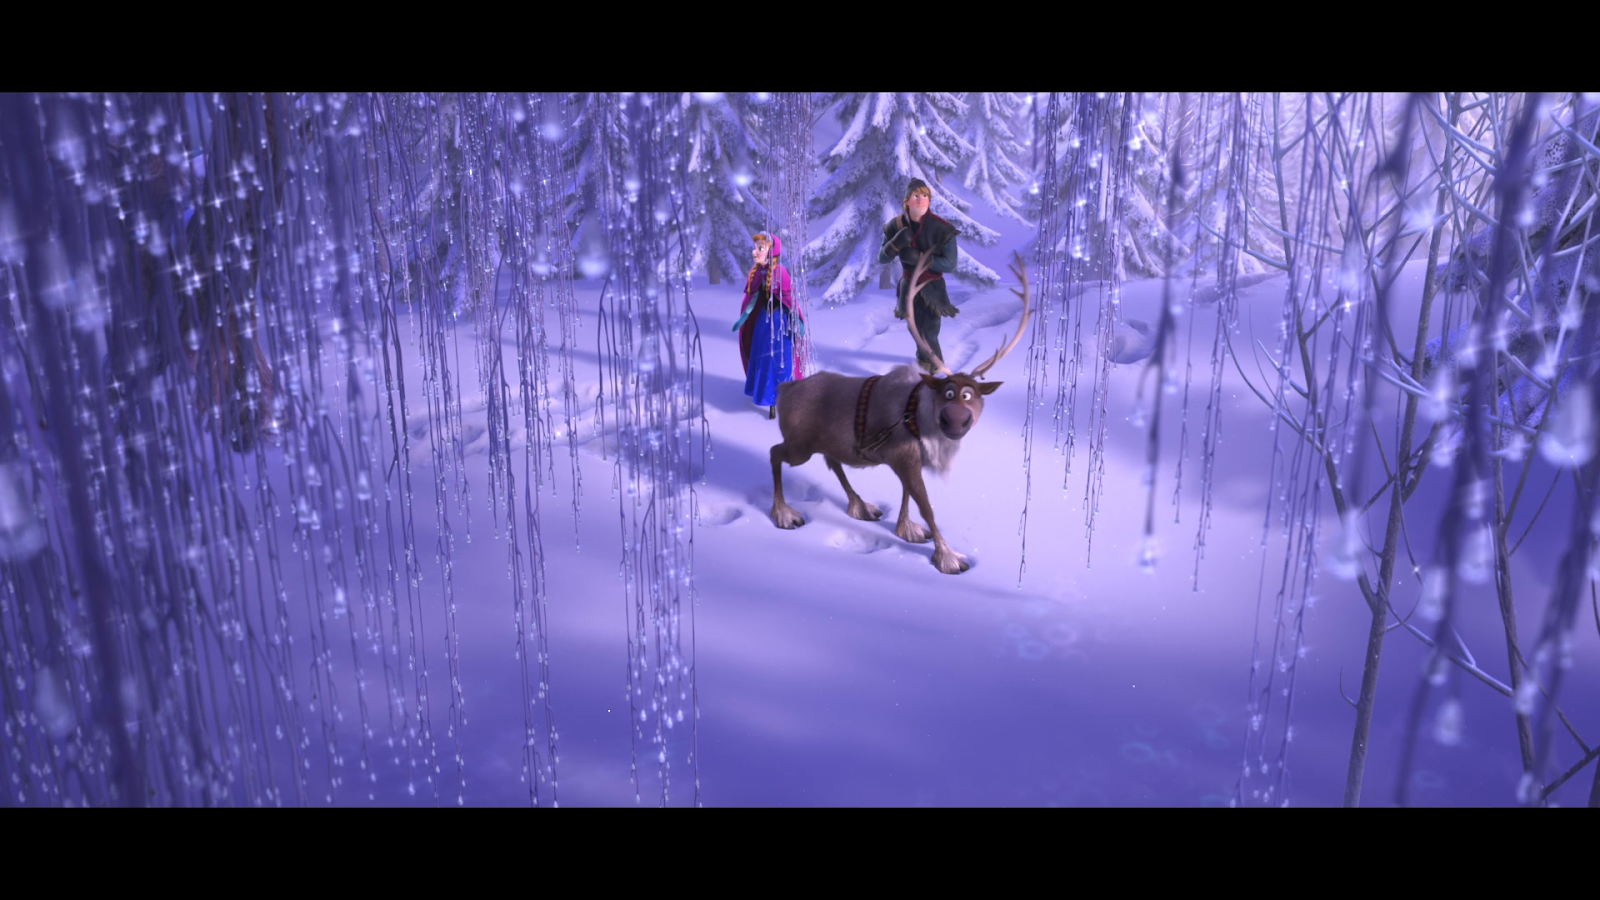 Frozen: Una Aventura Congelada (2013) BRRip 720p Latino-Castellano-Ingles captura 3